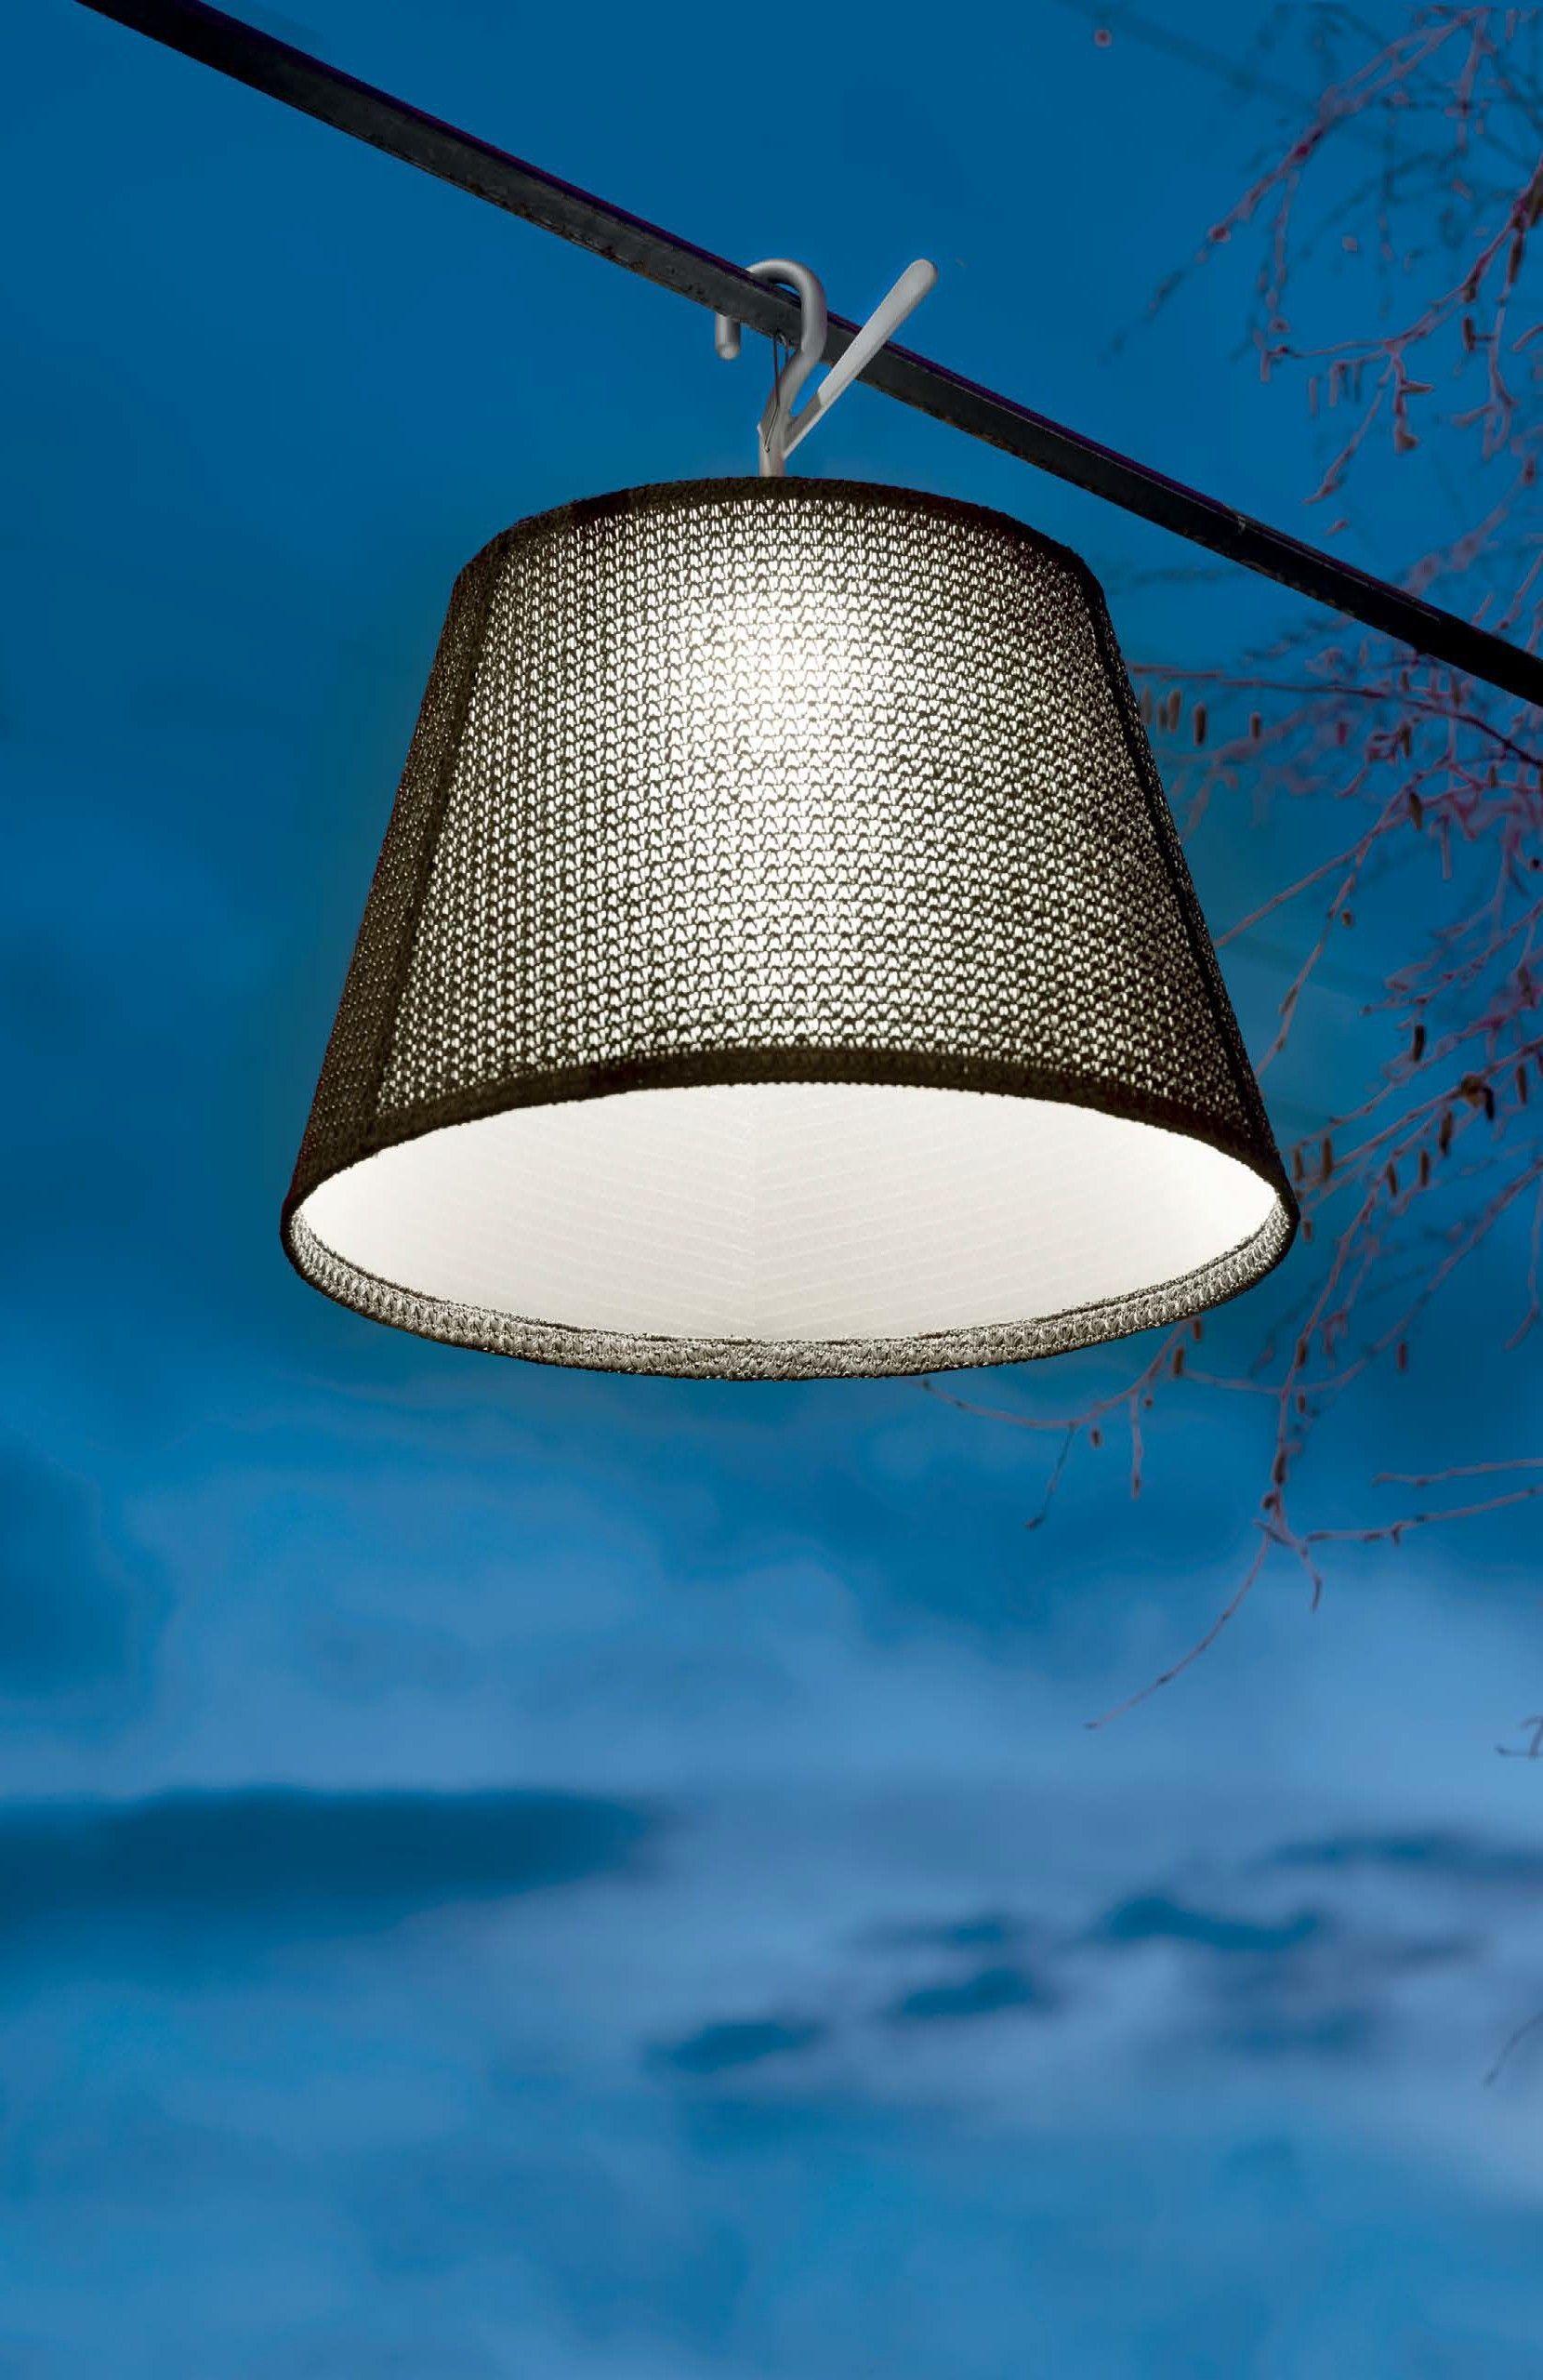 Artemide Tolomeo Mega Outdoor Hook Lamp Lamp Artemide Artemide Tolomeo